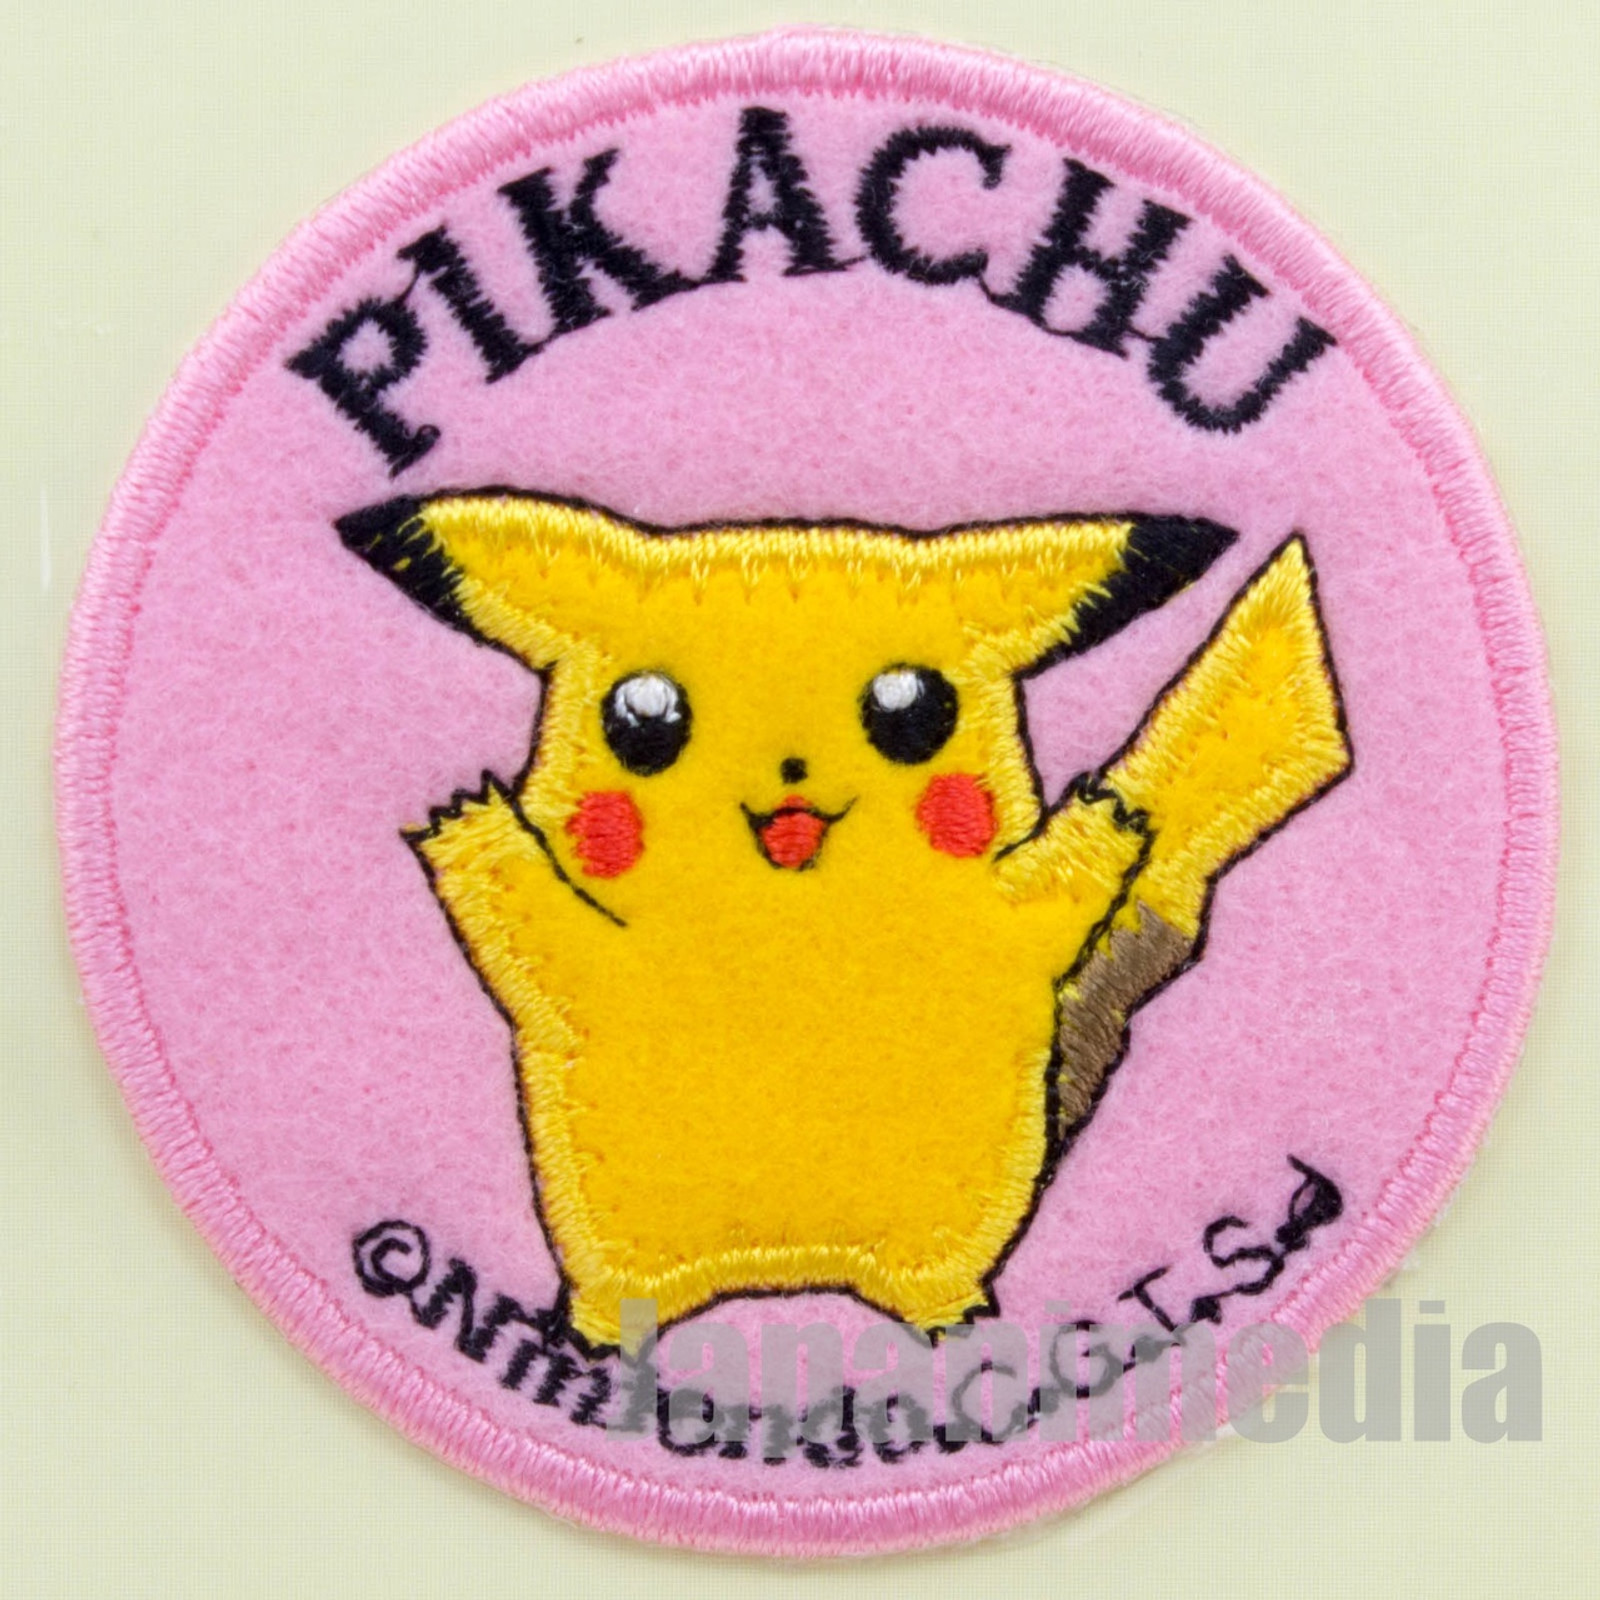 Pokemon Pikachu Interfacing Patch Badge Pocket Monsters JAPAN ANIME GAME 2